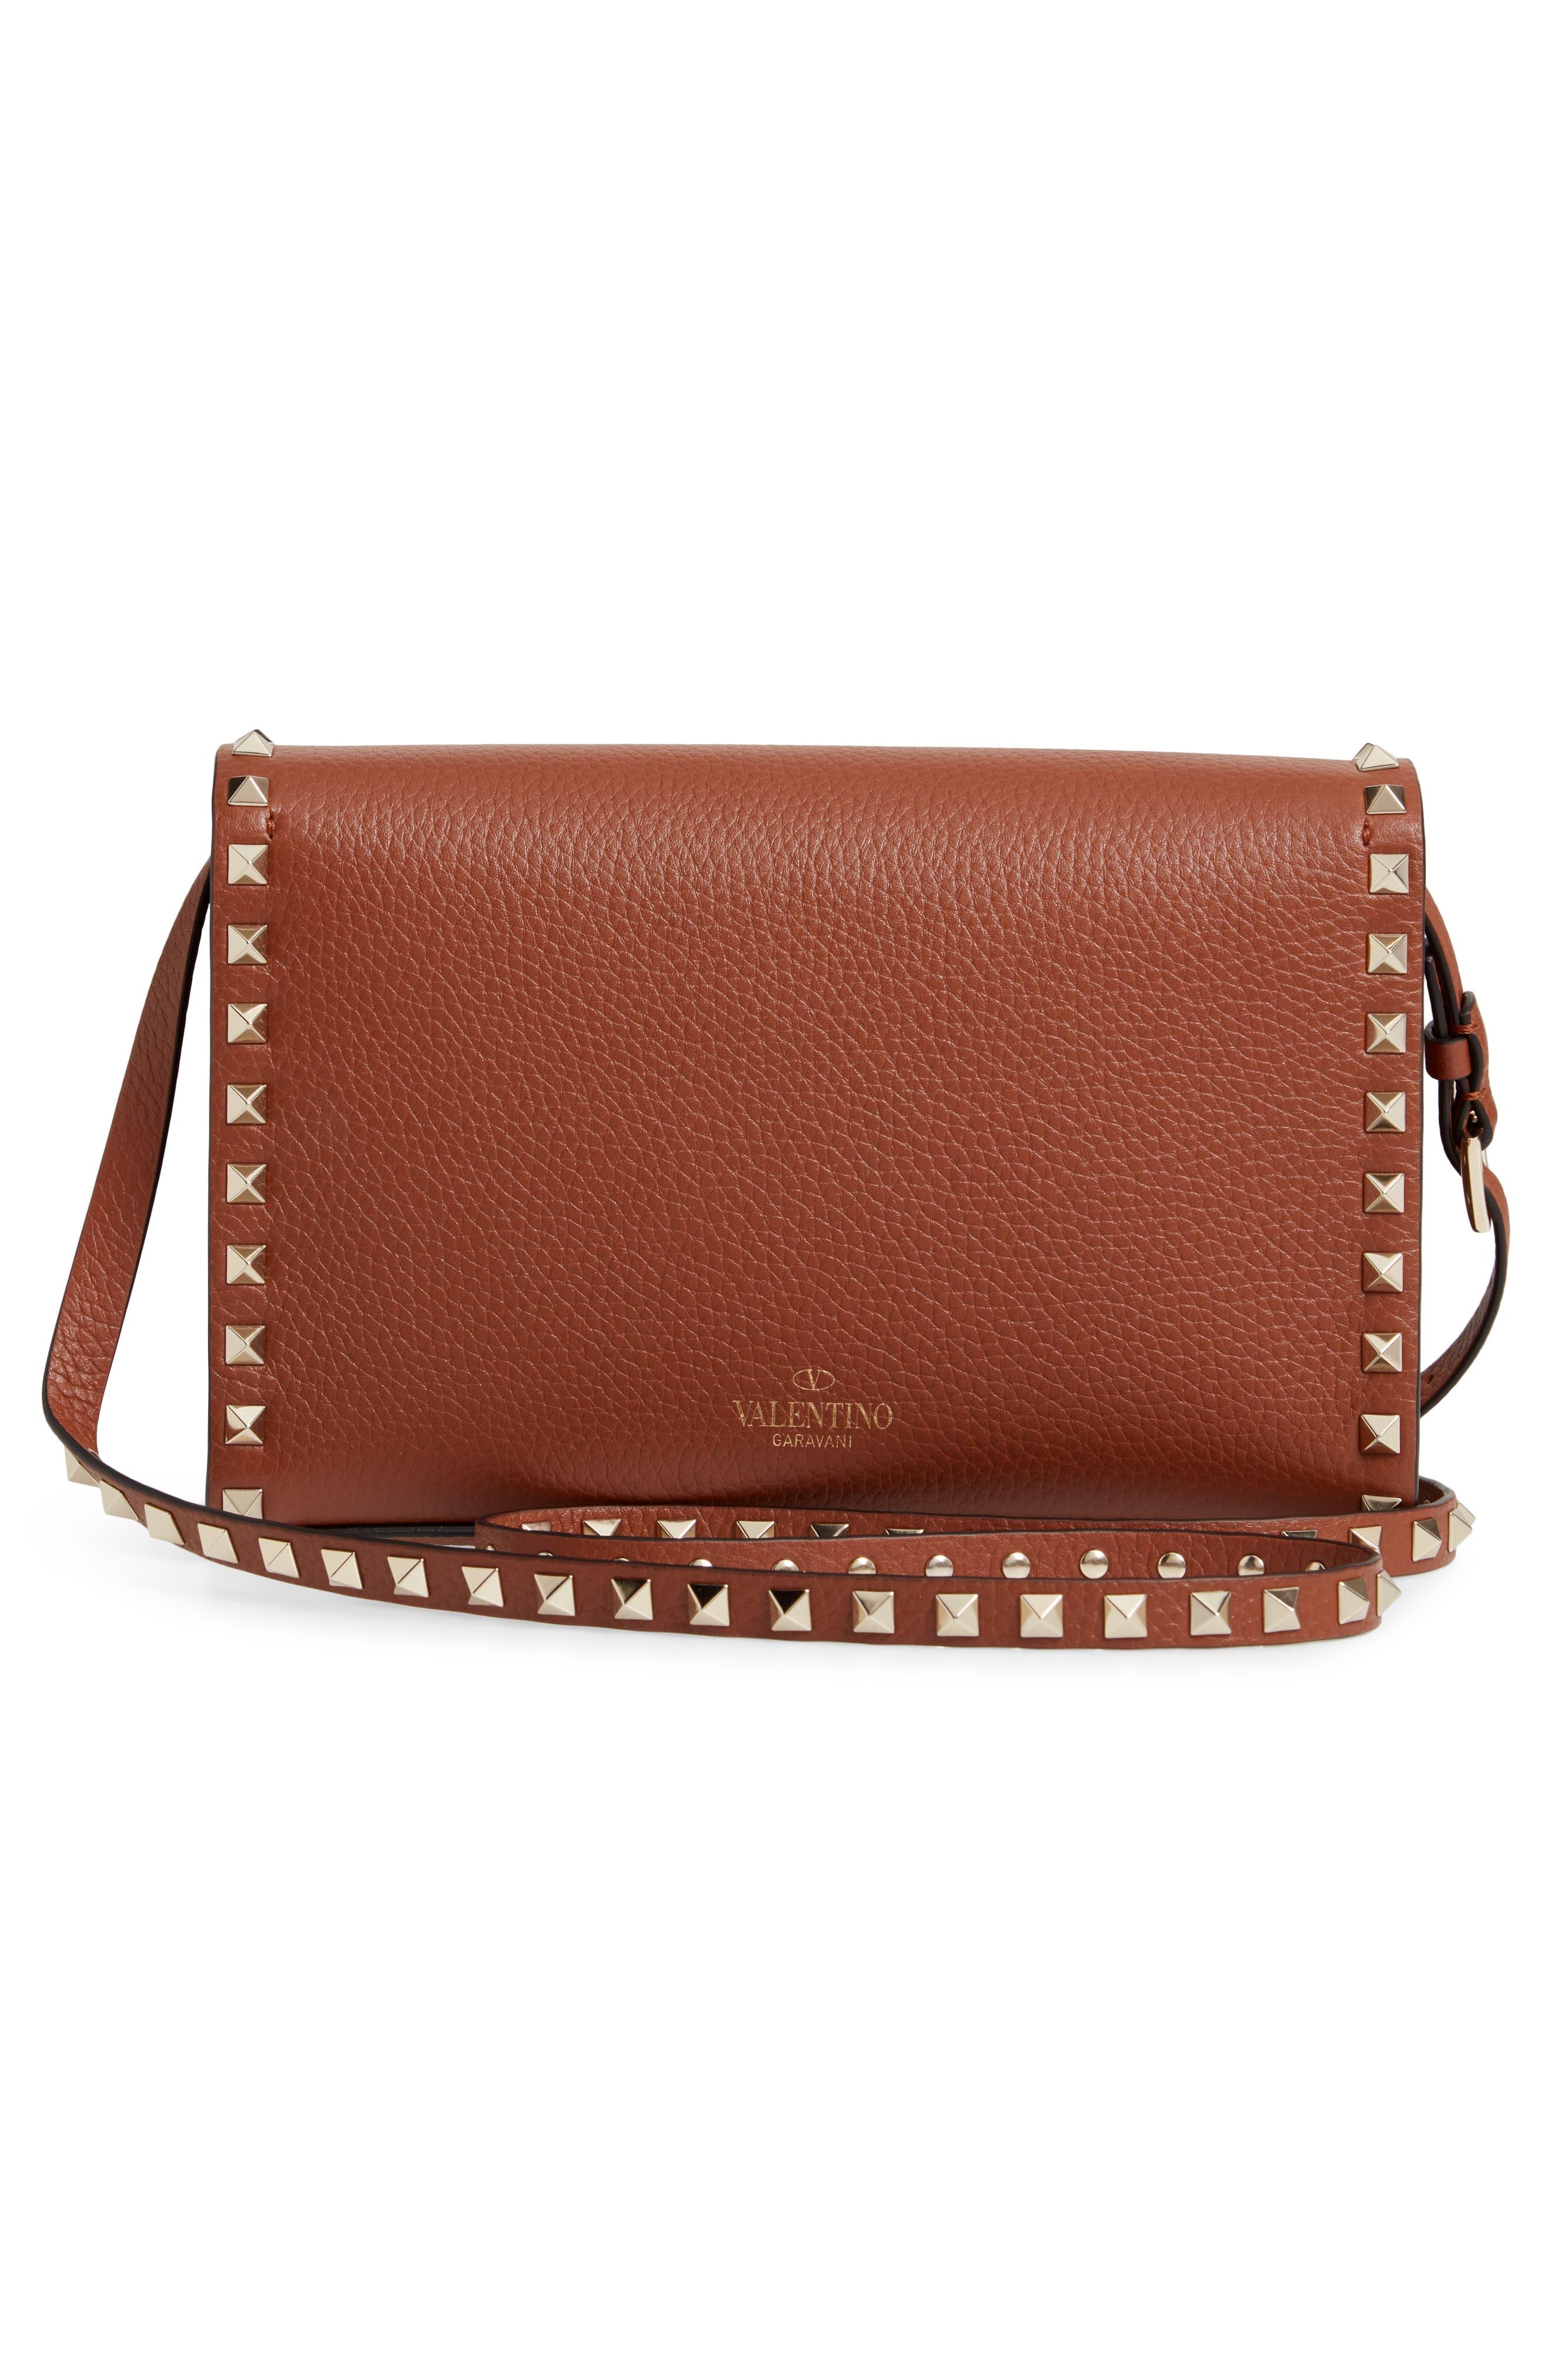 VALENTINO GARAVANI, Medium Rockstud Leather Crossbody Bag, Alternate thumbnail 3, color, BRIGHT COGNAC